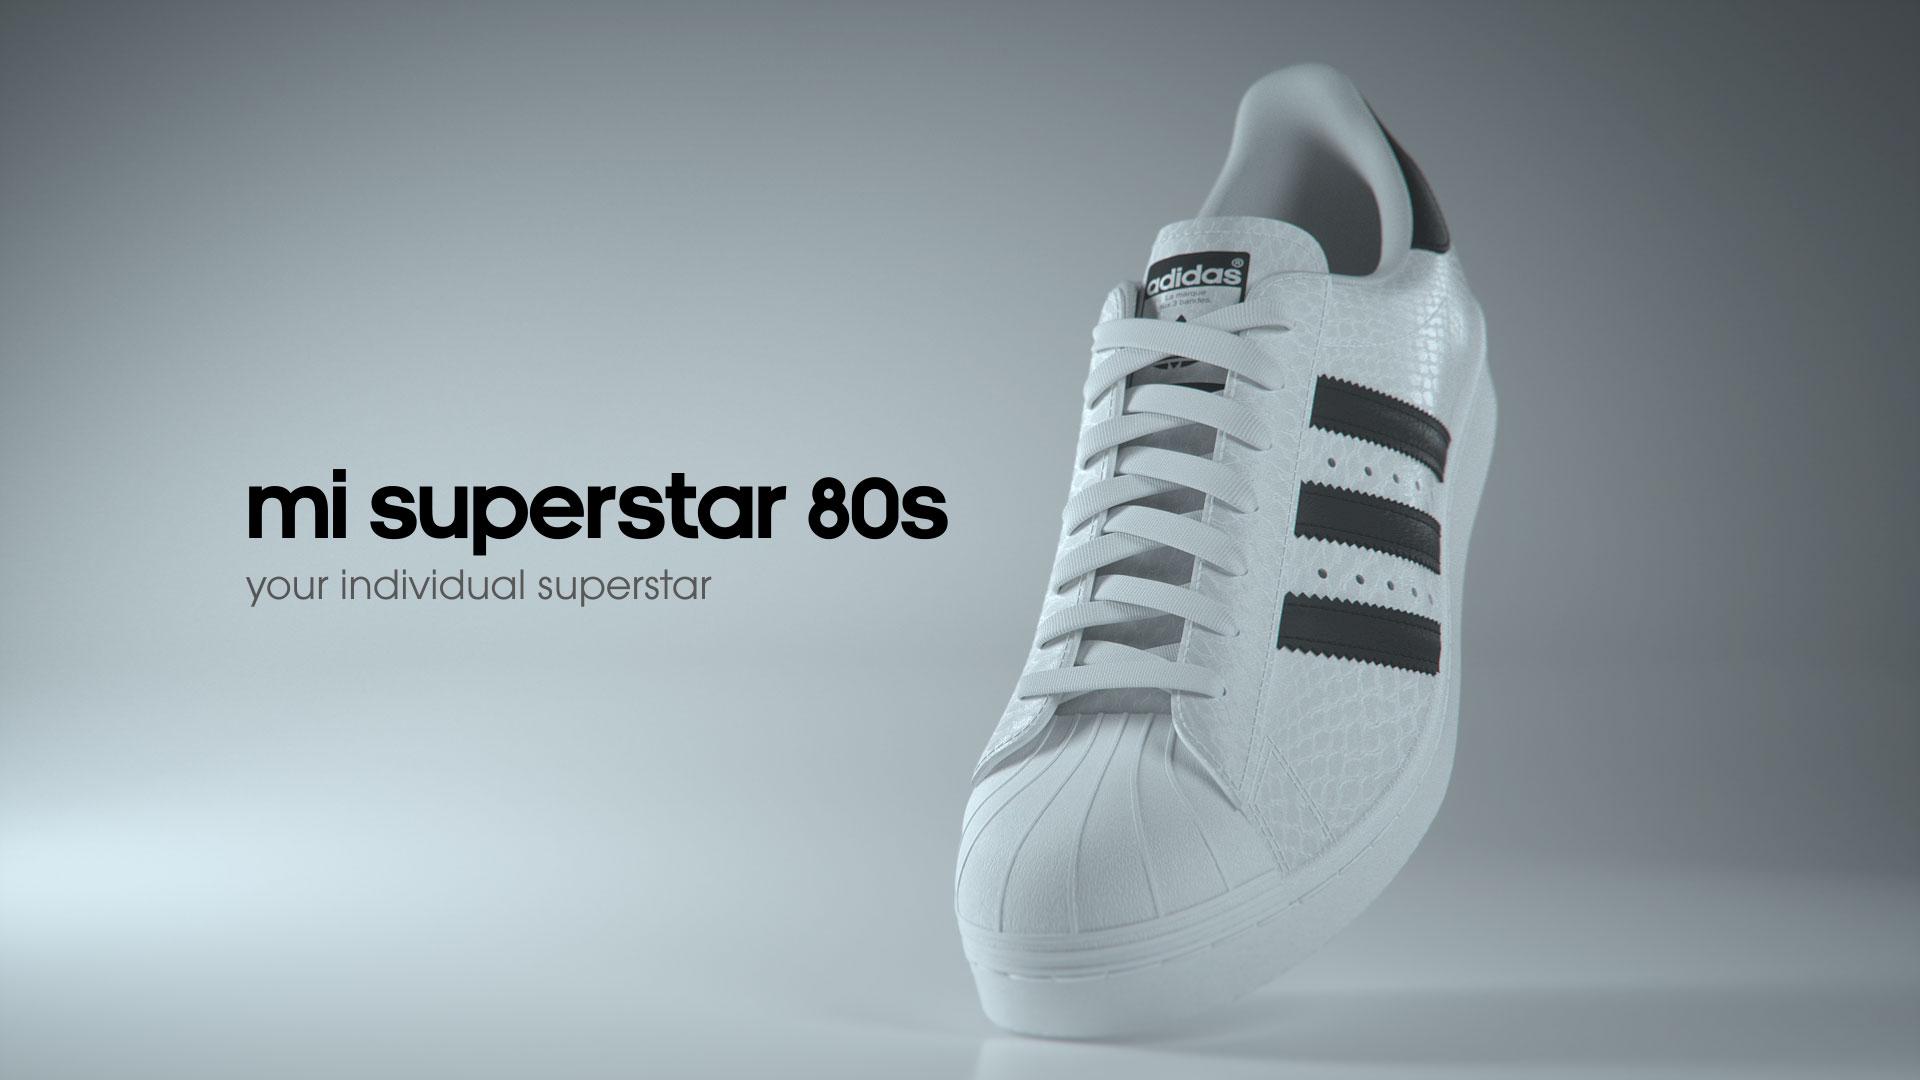 Customizing Superstar